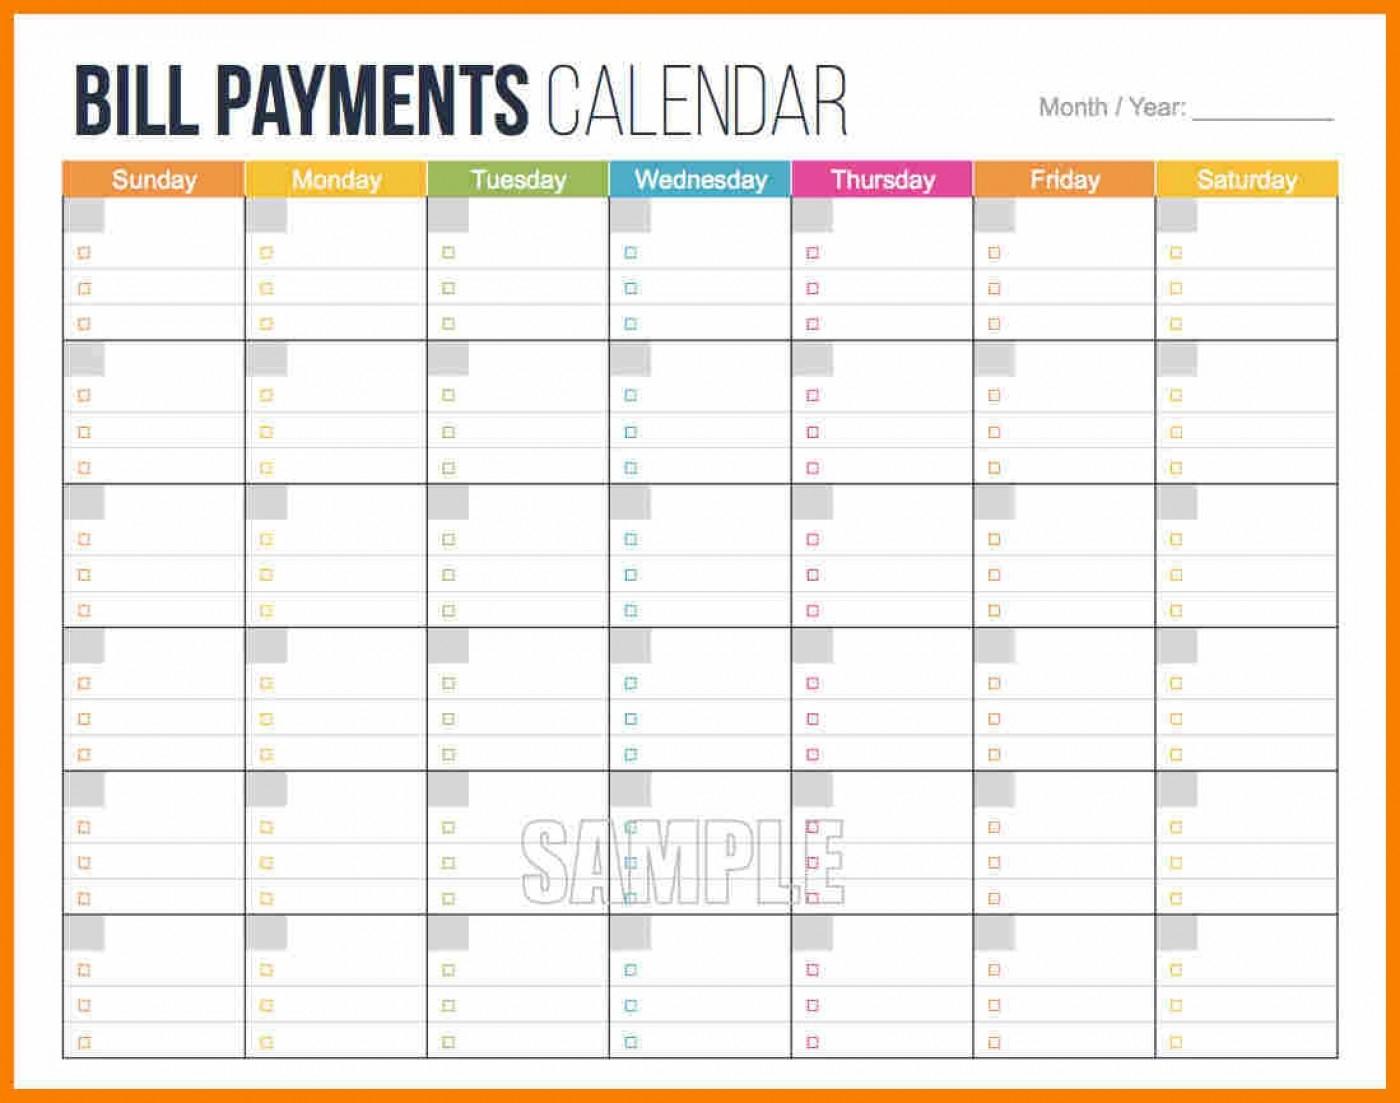 008 Template Ideas Bill Pay Schedule Calendar 2 Unusual Payment throughout Monthly Bill Calendar Template Printable